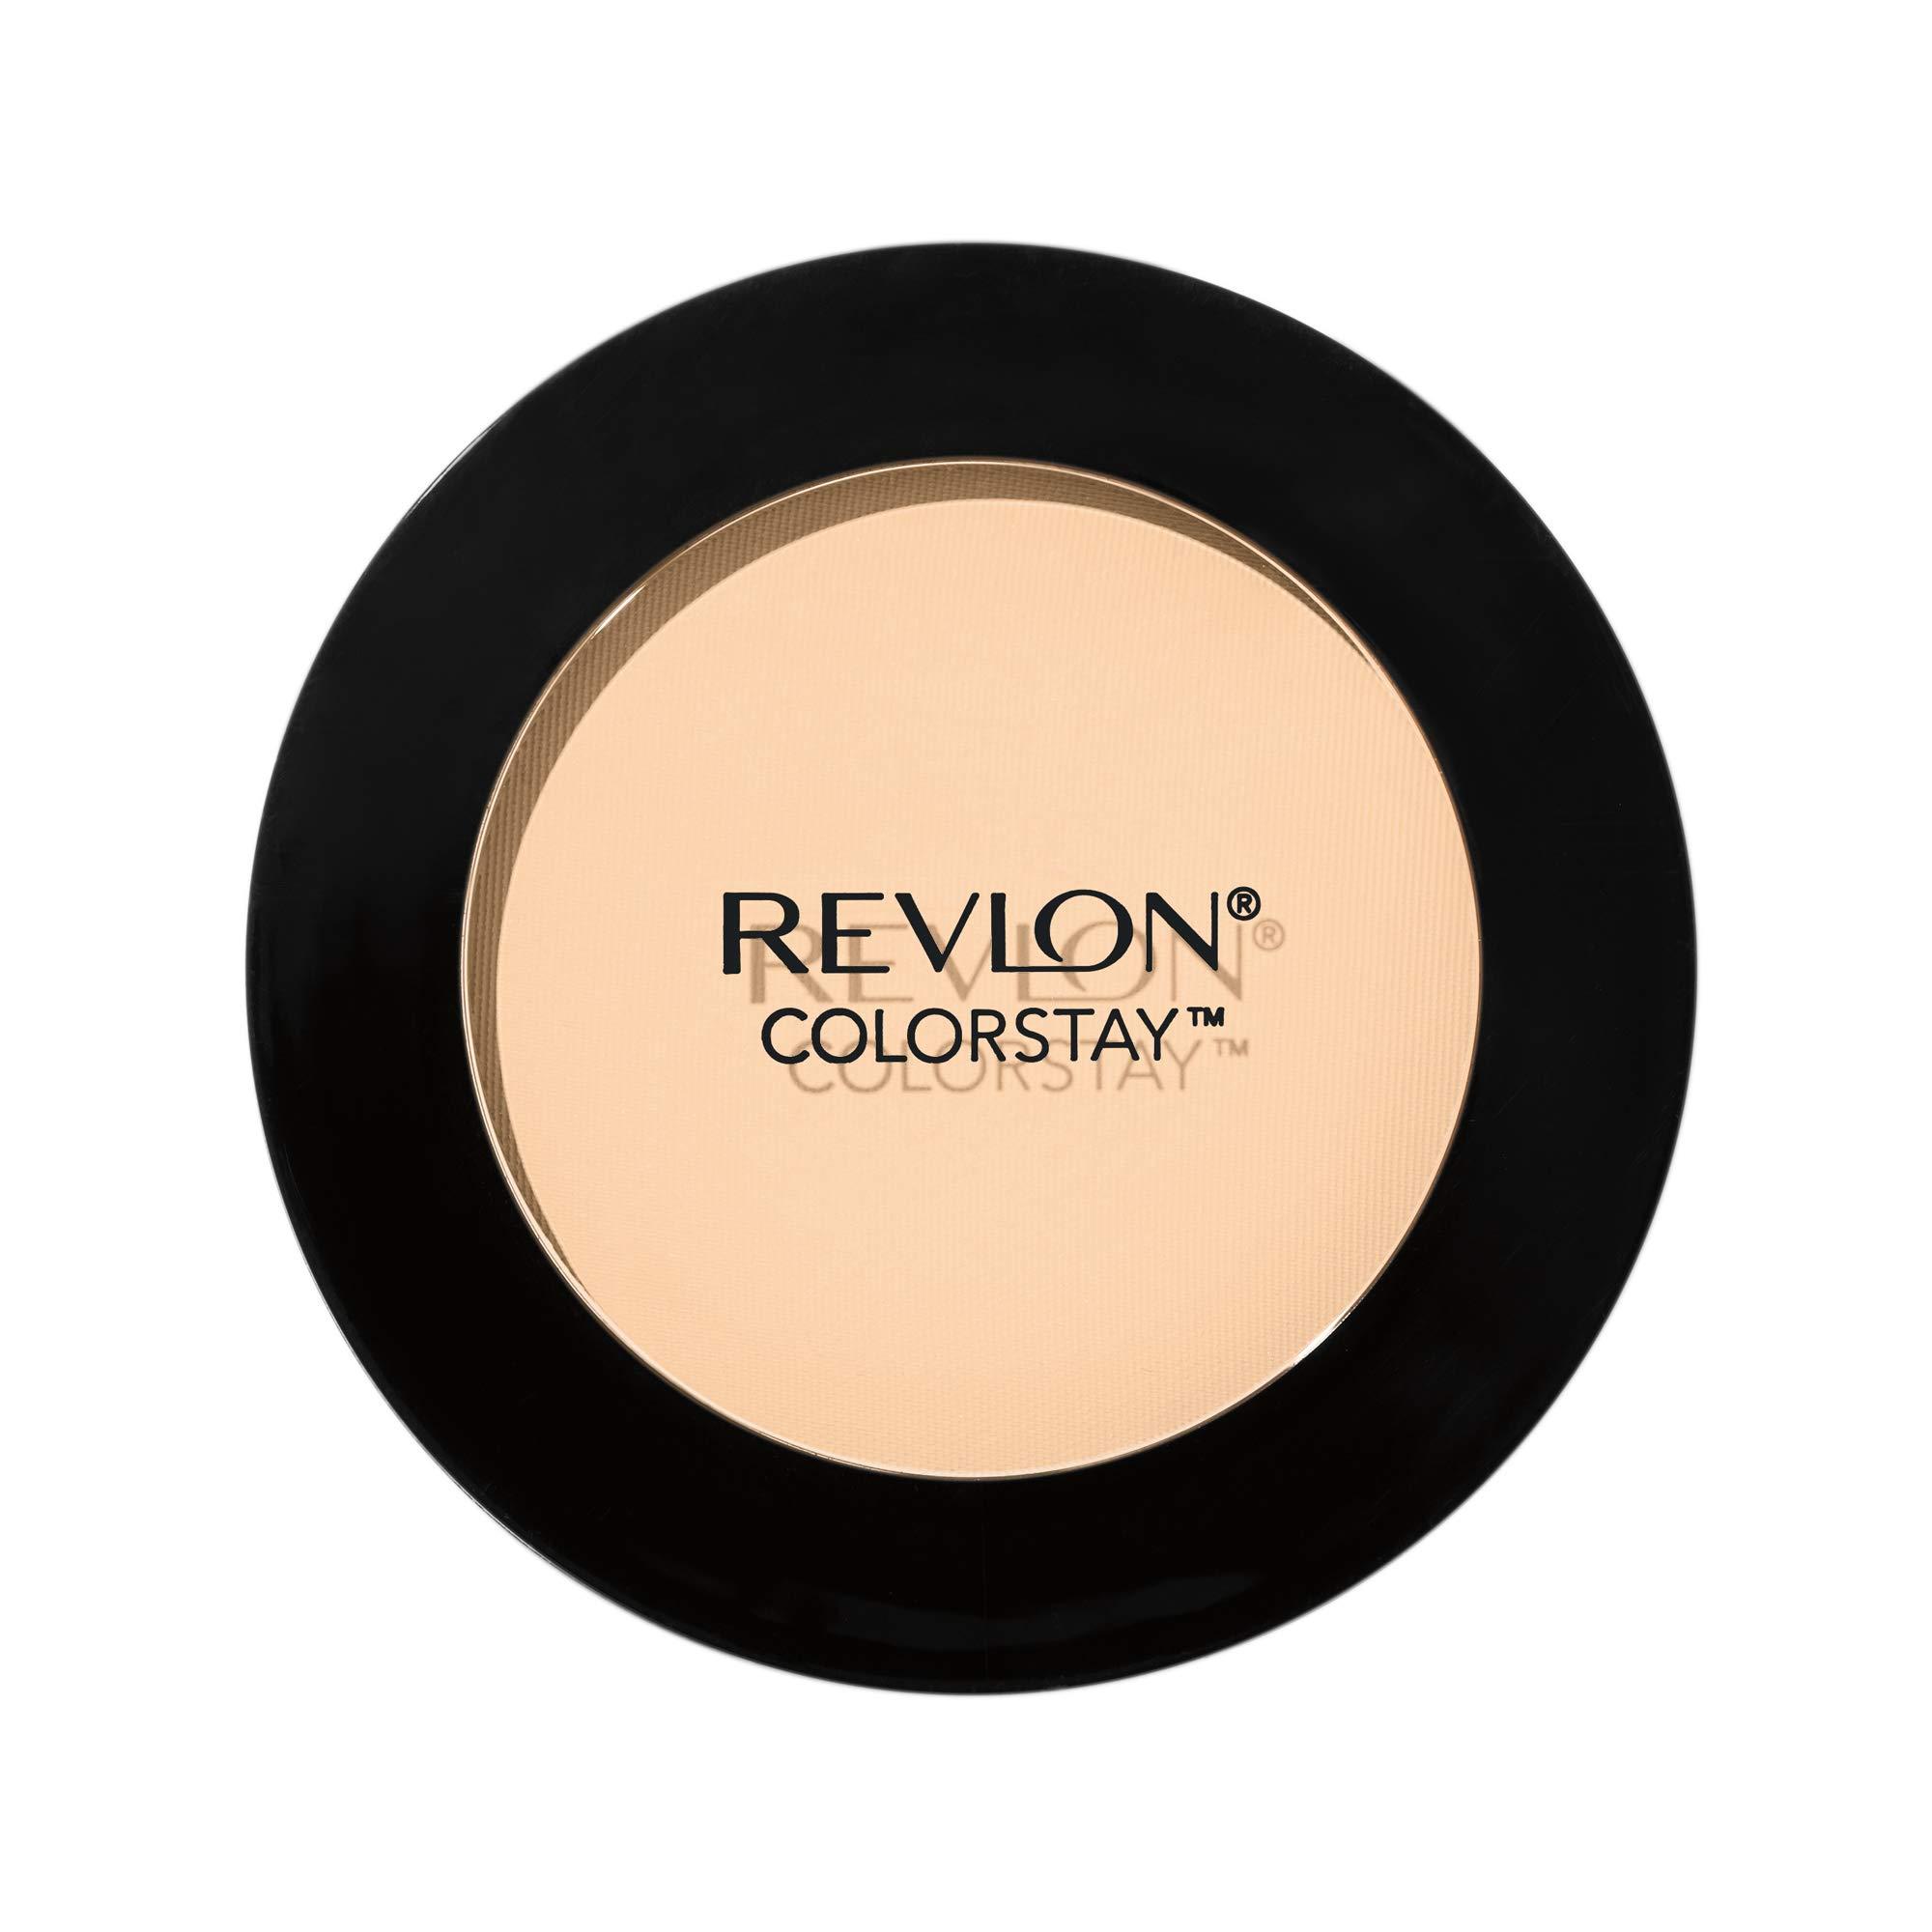 Revlon ColorStay Pressed Powder, Longwearing Oil Free, Fragrance Free, Noncomedogenic, 330 Natural Tan, 0.30 oz